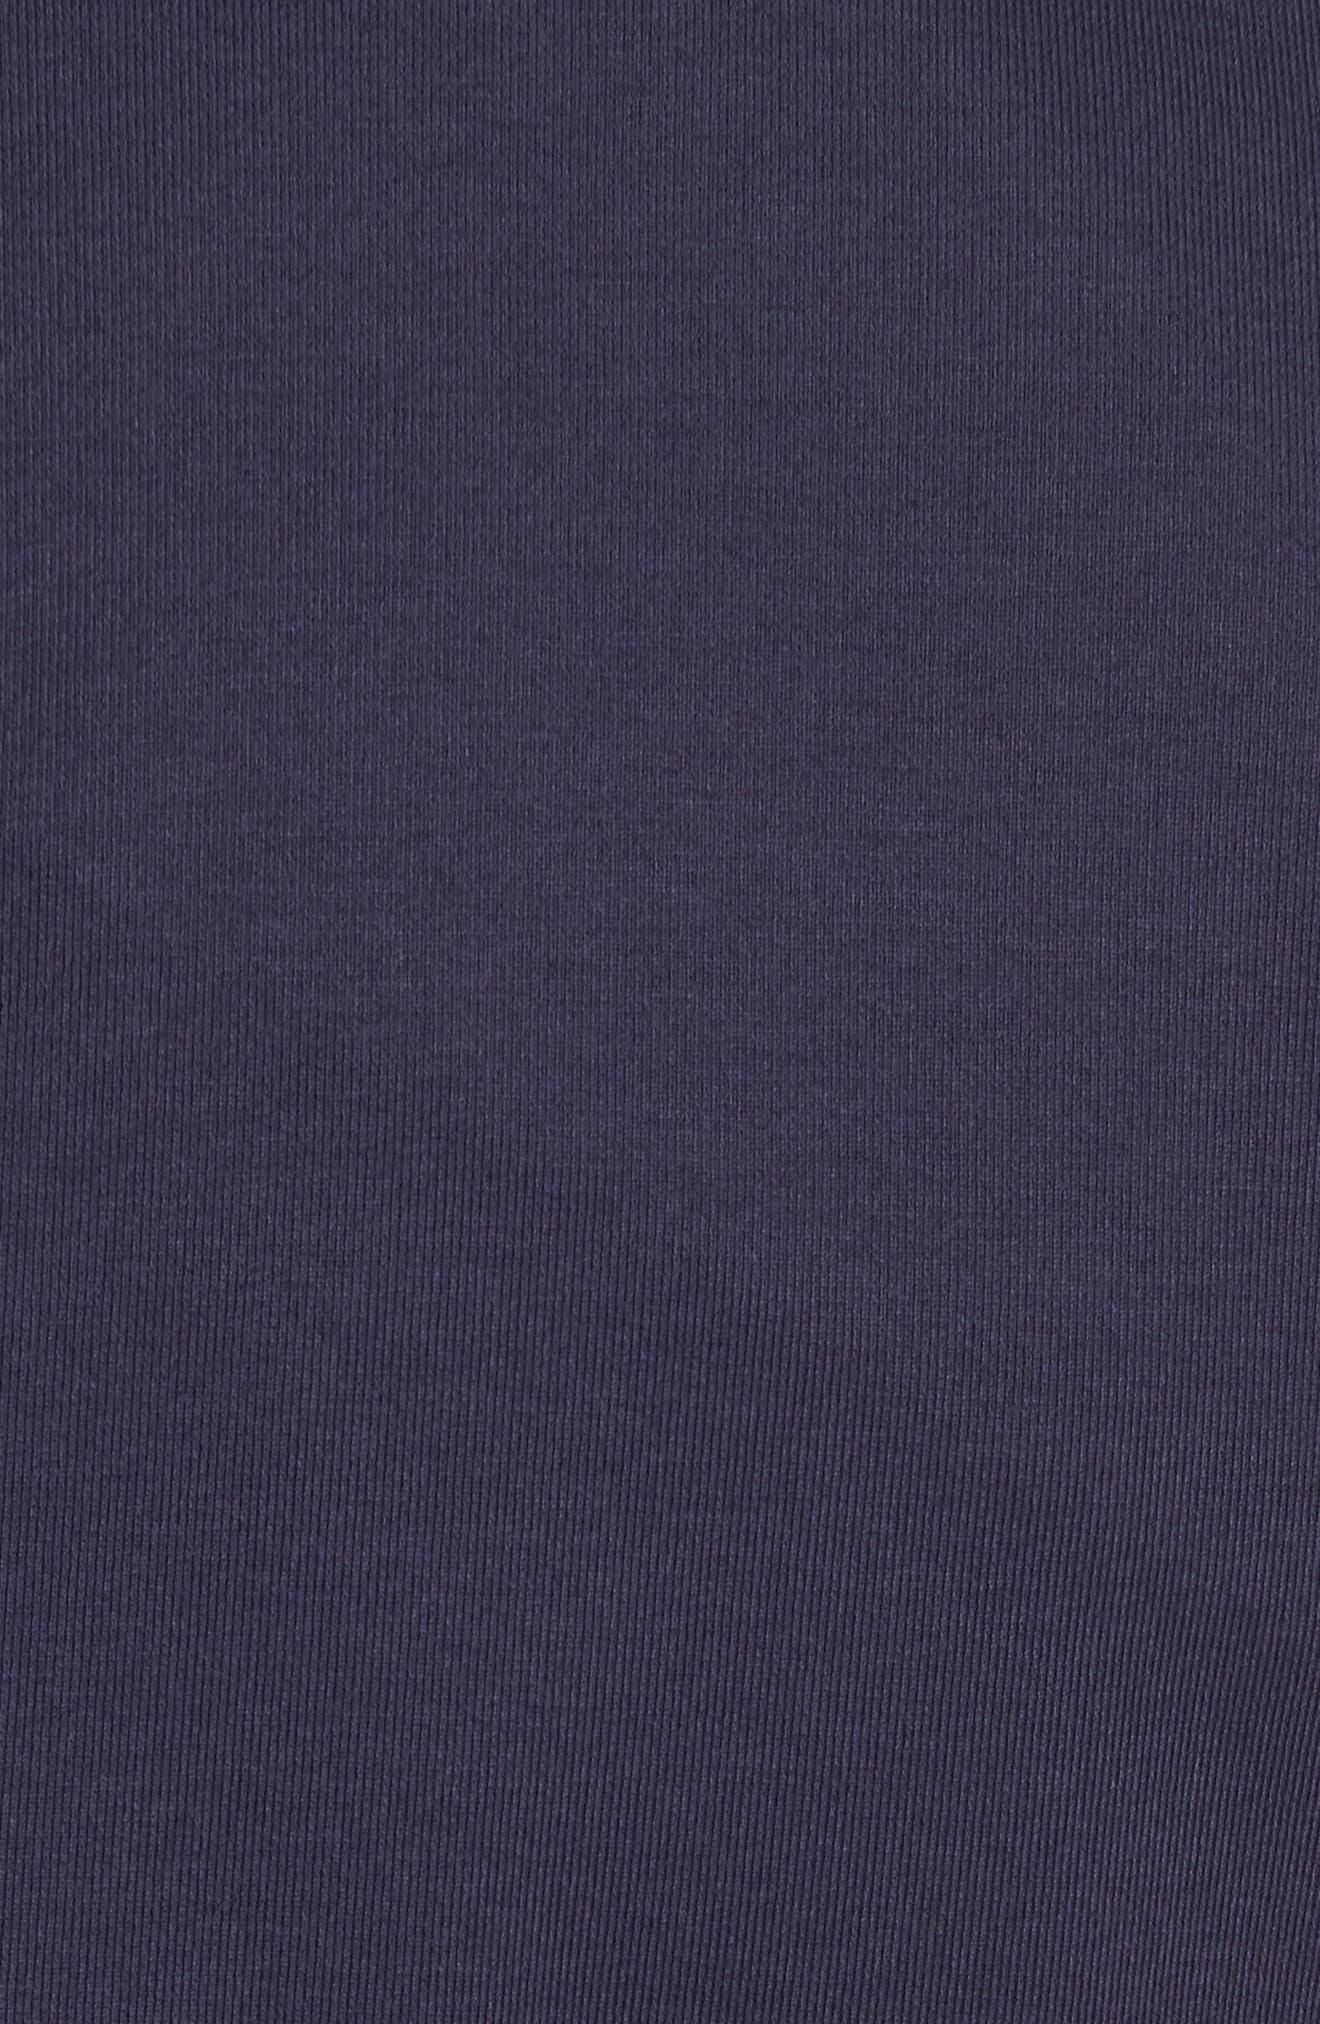 Santorini Jersey Knit Jacket,                             Alternate thumbnail 6, color,                             417